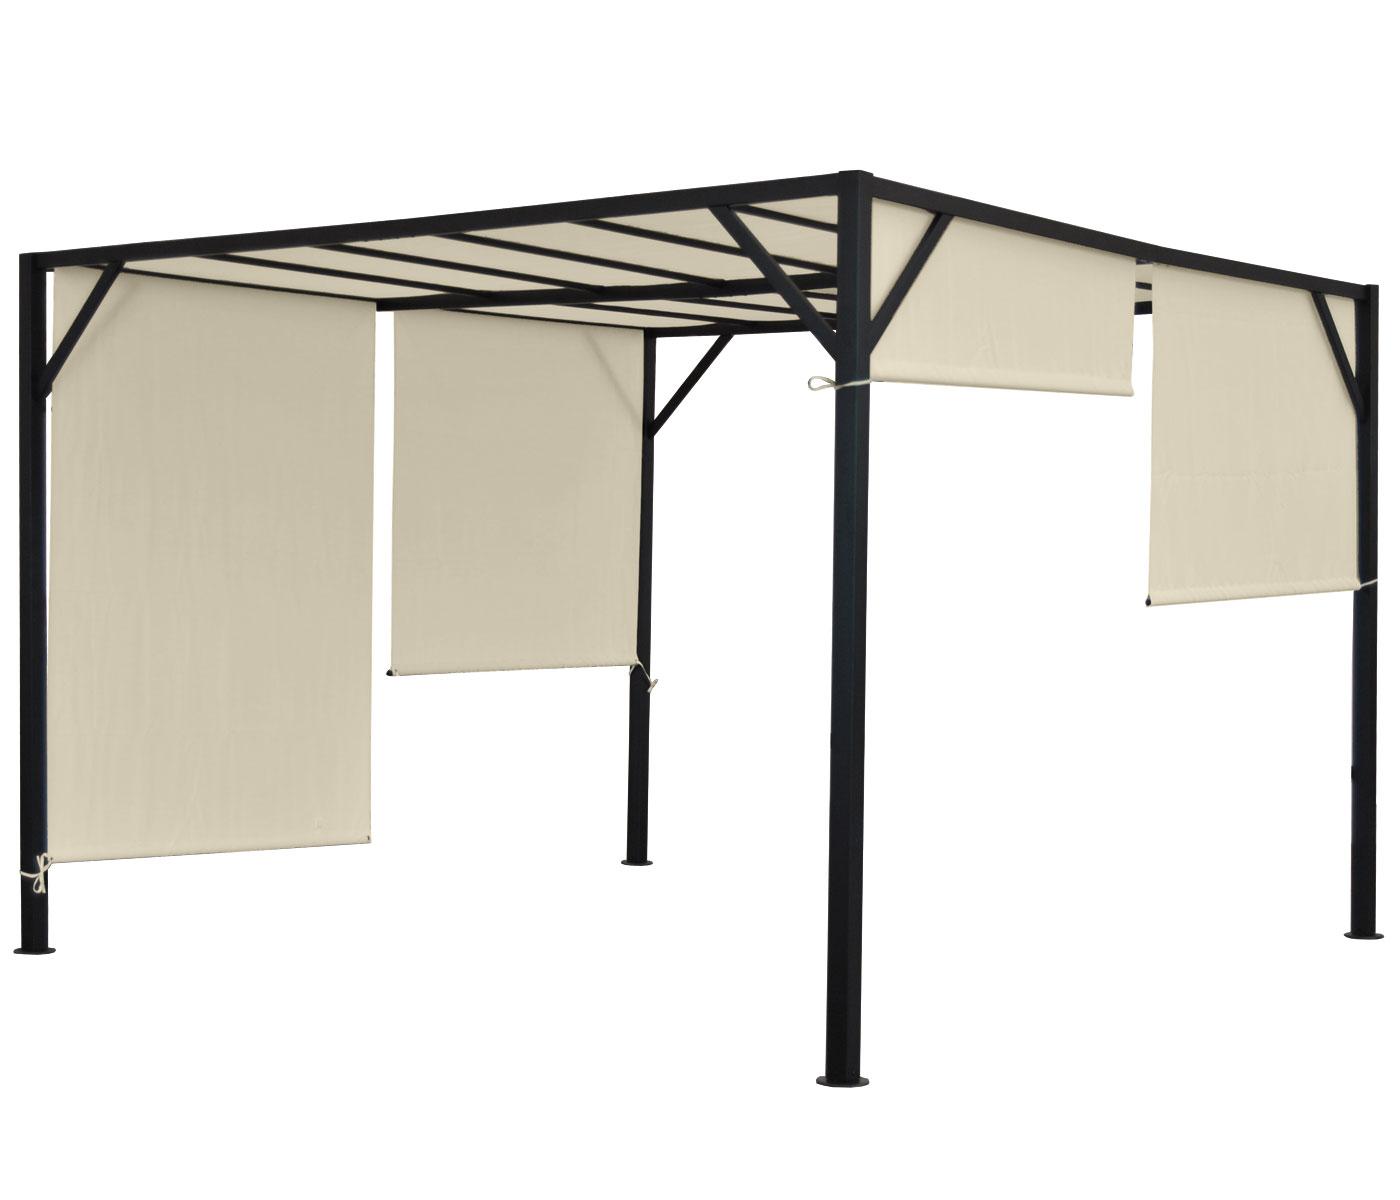 pawilon ogrodowy pergola tarasowa przesuwny dach. Black Bedroom Furniture Sets. Home Design Ideas